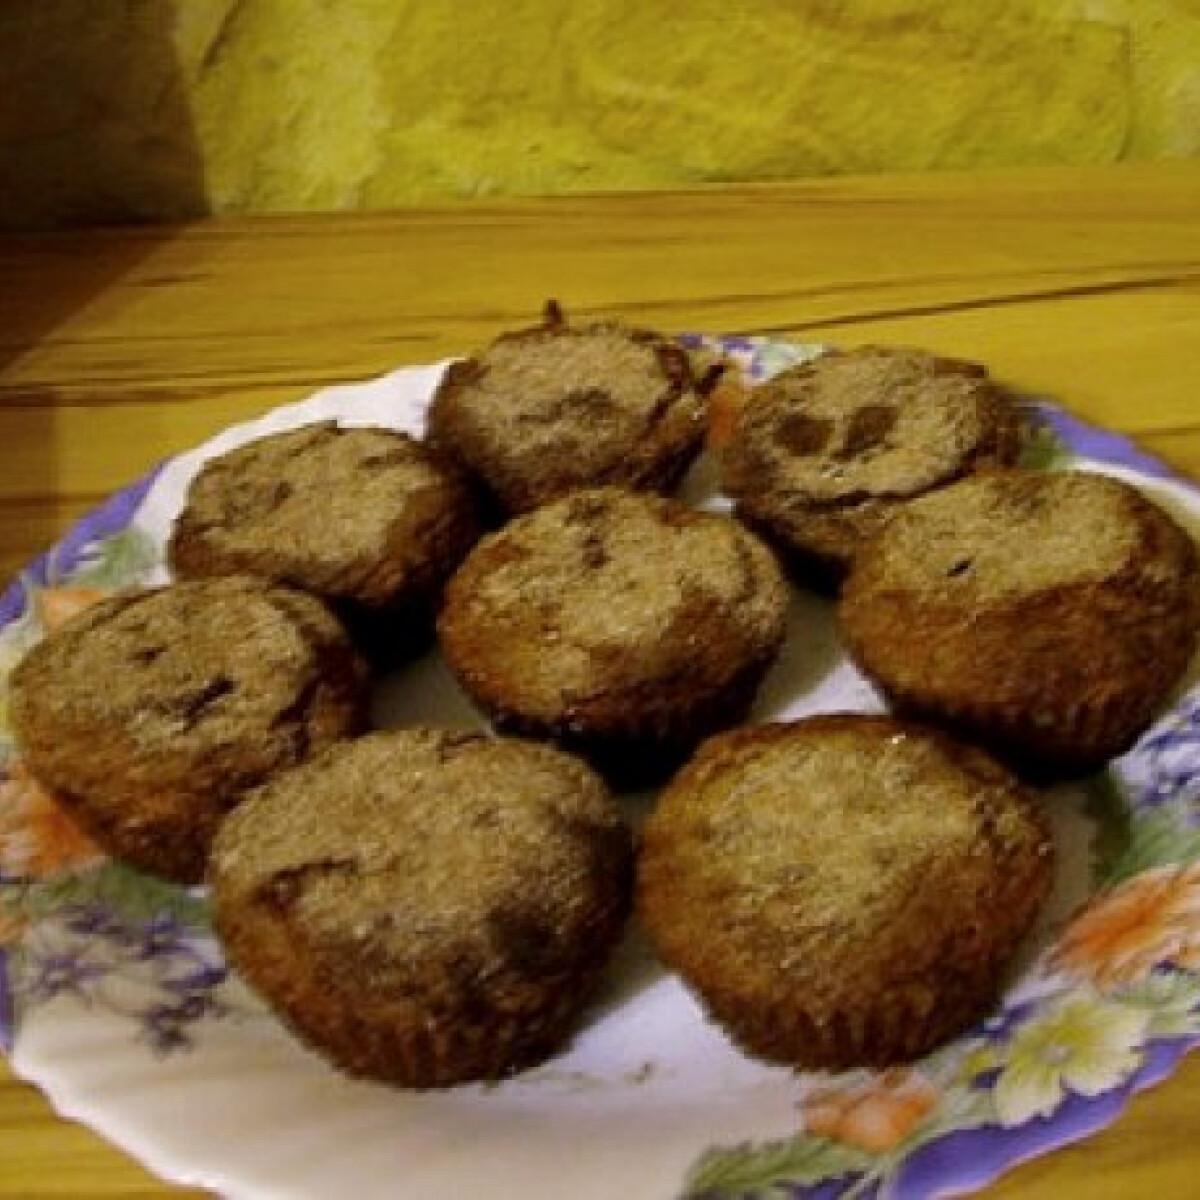 Fahéjjal megszórt almás muffin